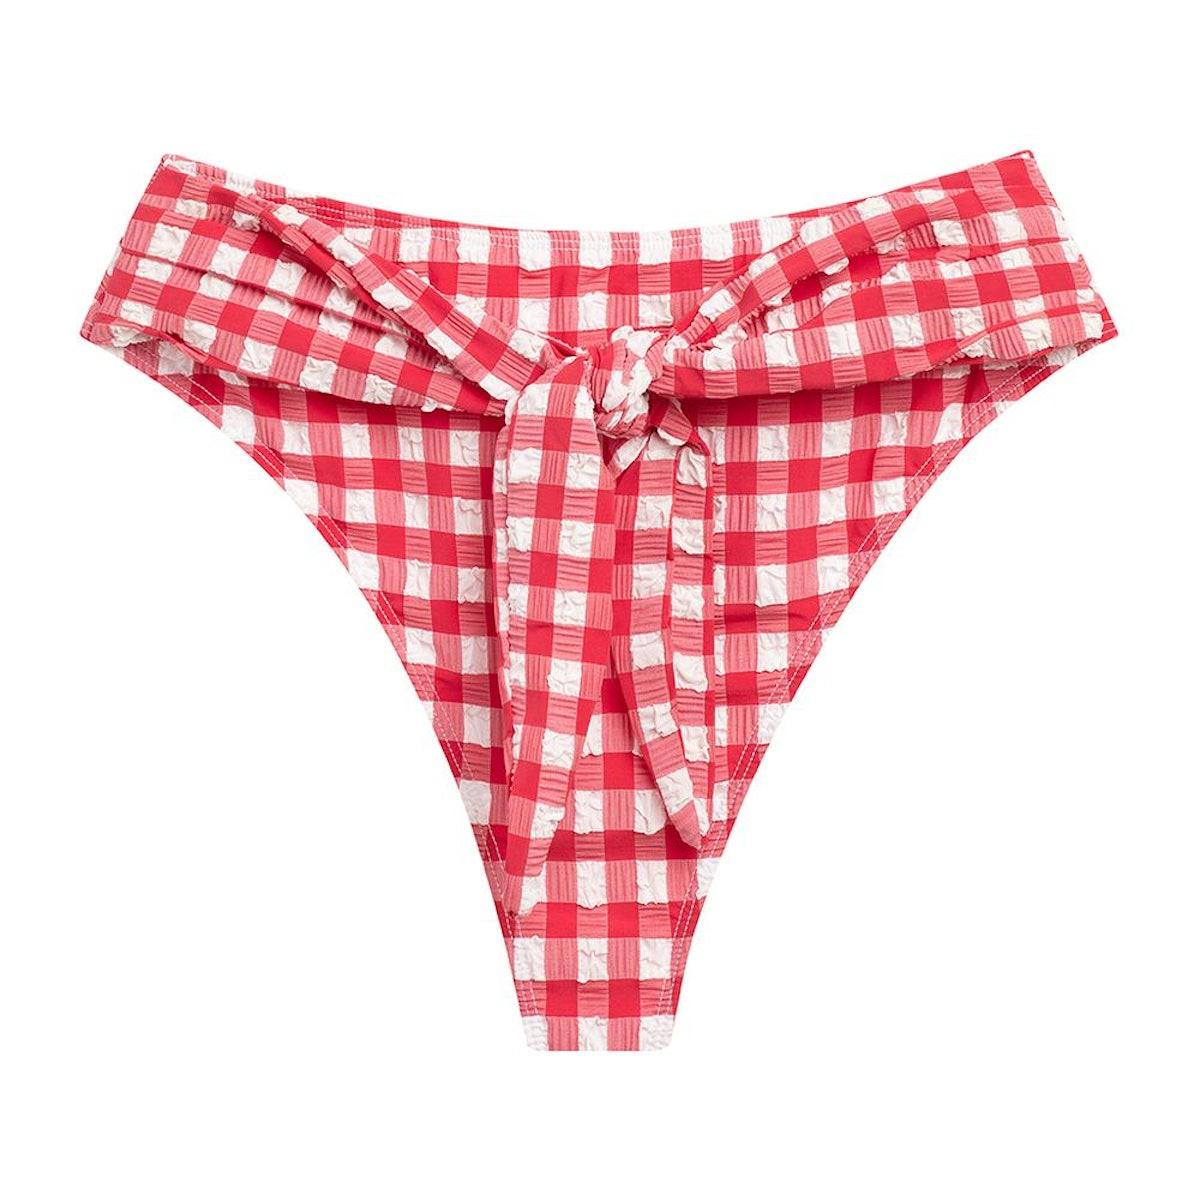 Paula Tie-Up Bikini Bottom